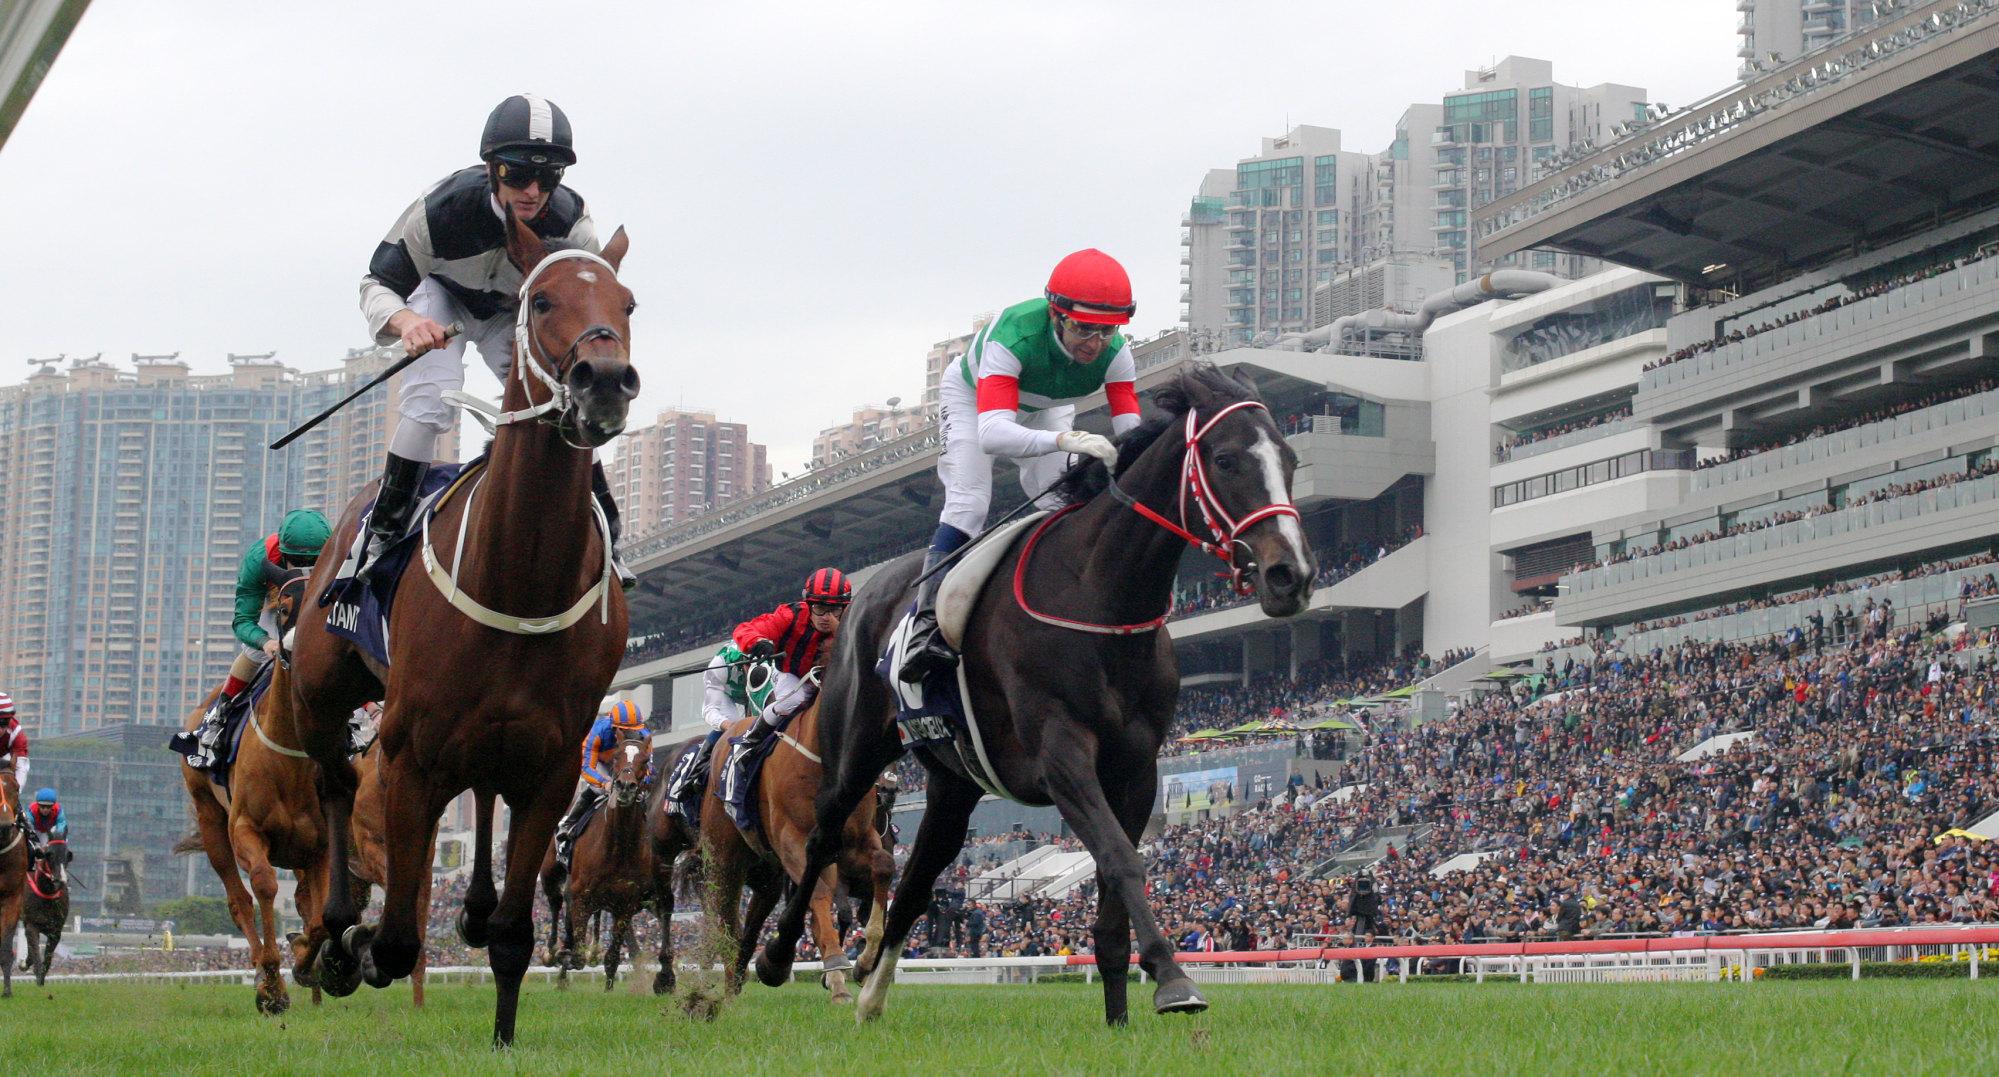 Exultant (left) defeats Lys Gracieux to win the 2018 Hong Kong Vase.